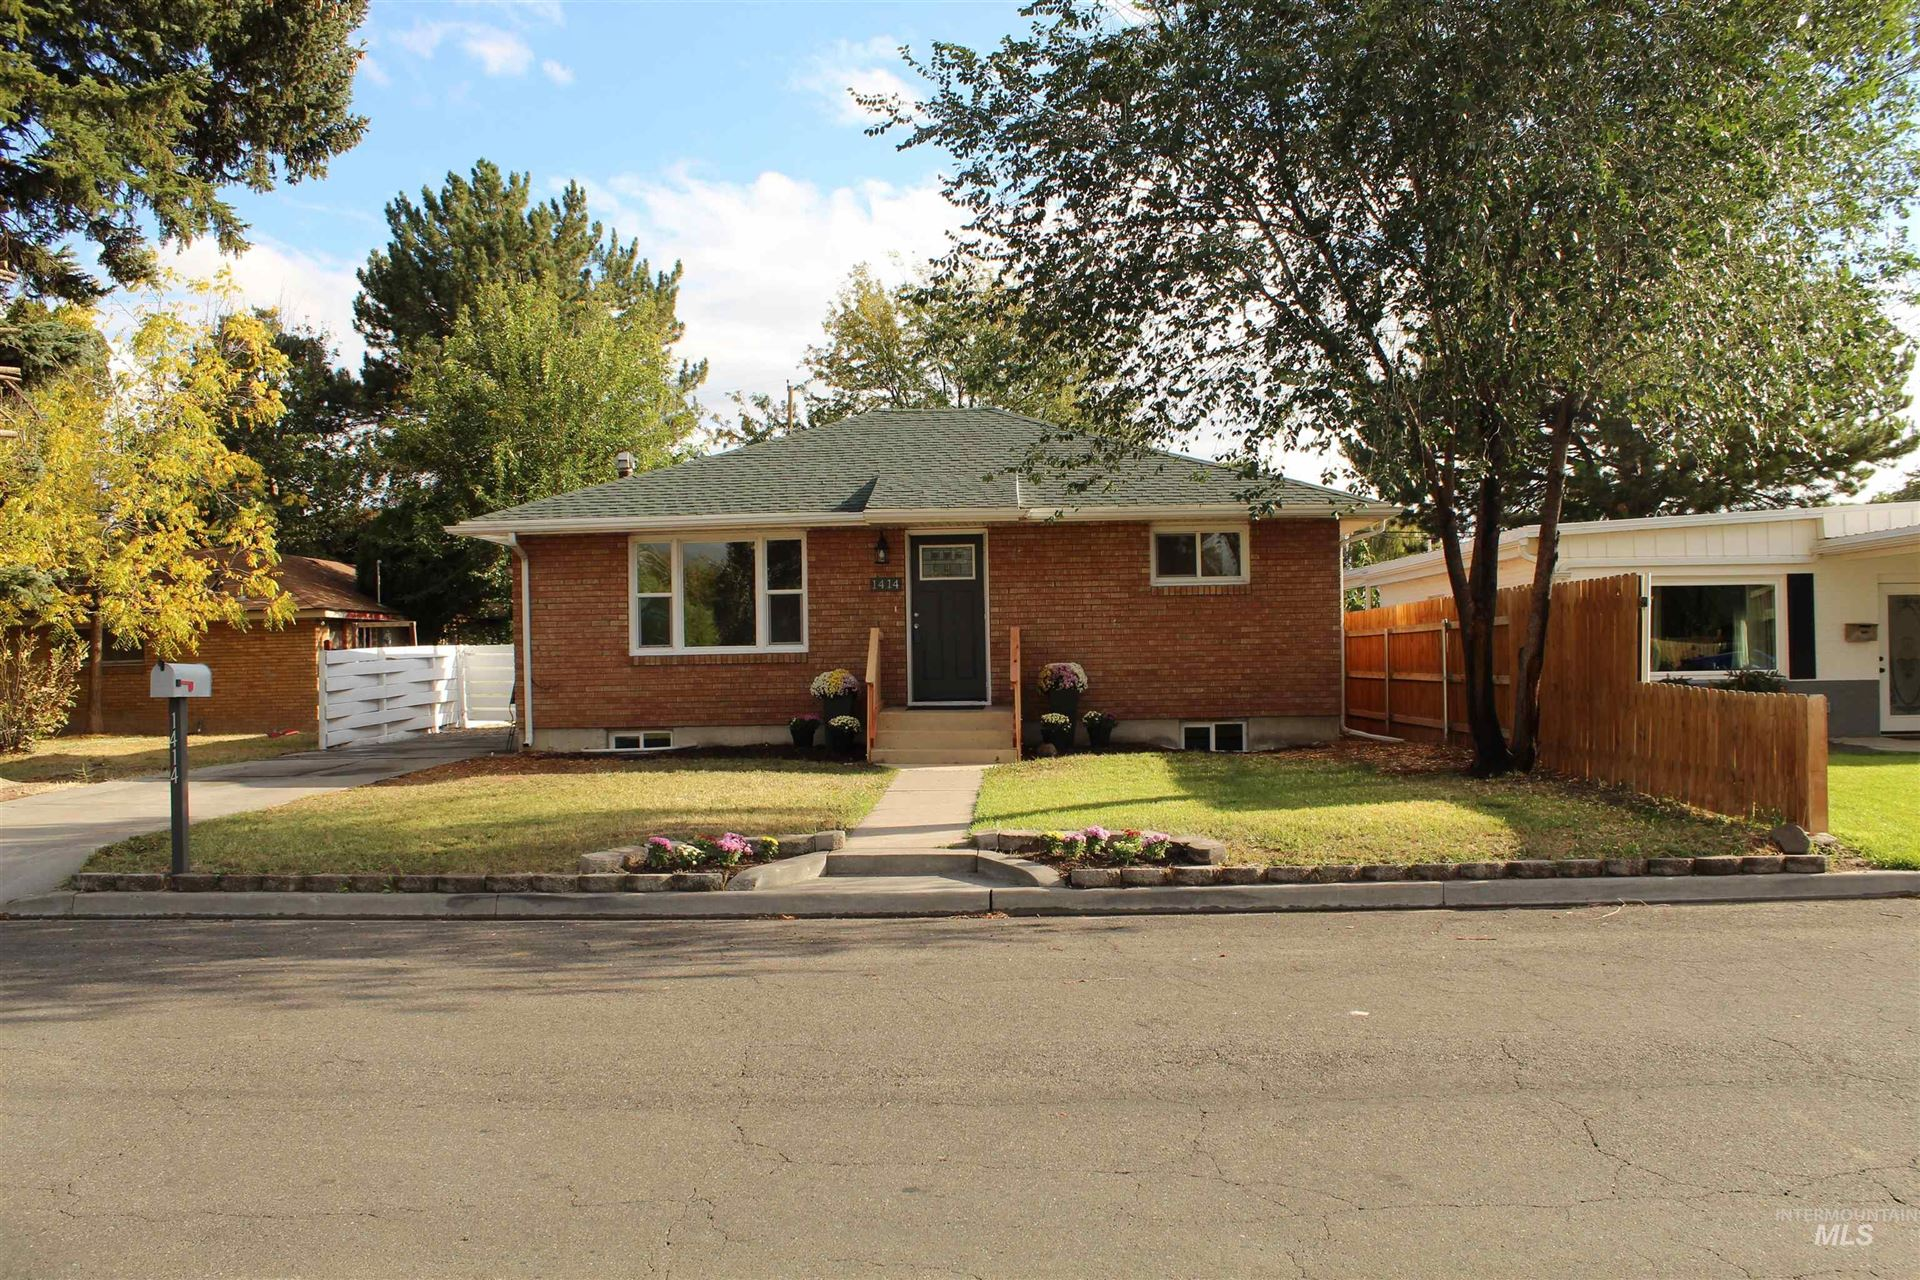 Photo of 1414 Spruce Avenue, Twin Falls, ID 83301 (MLS # 98807009)